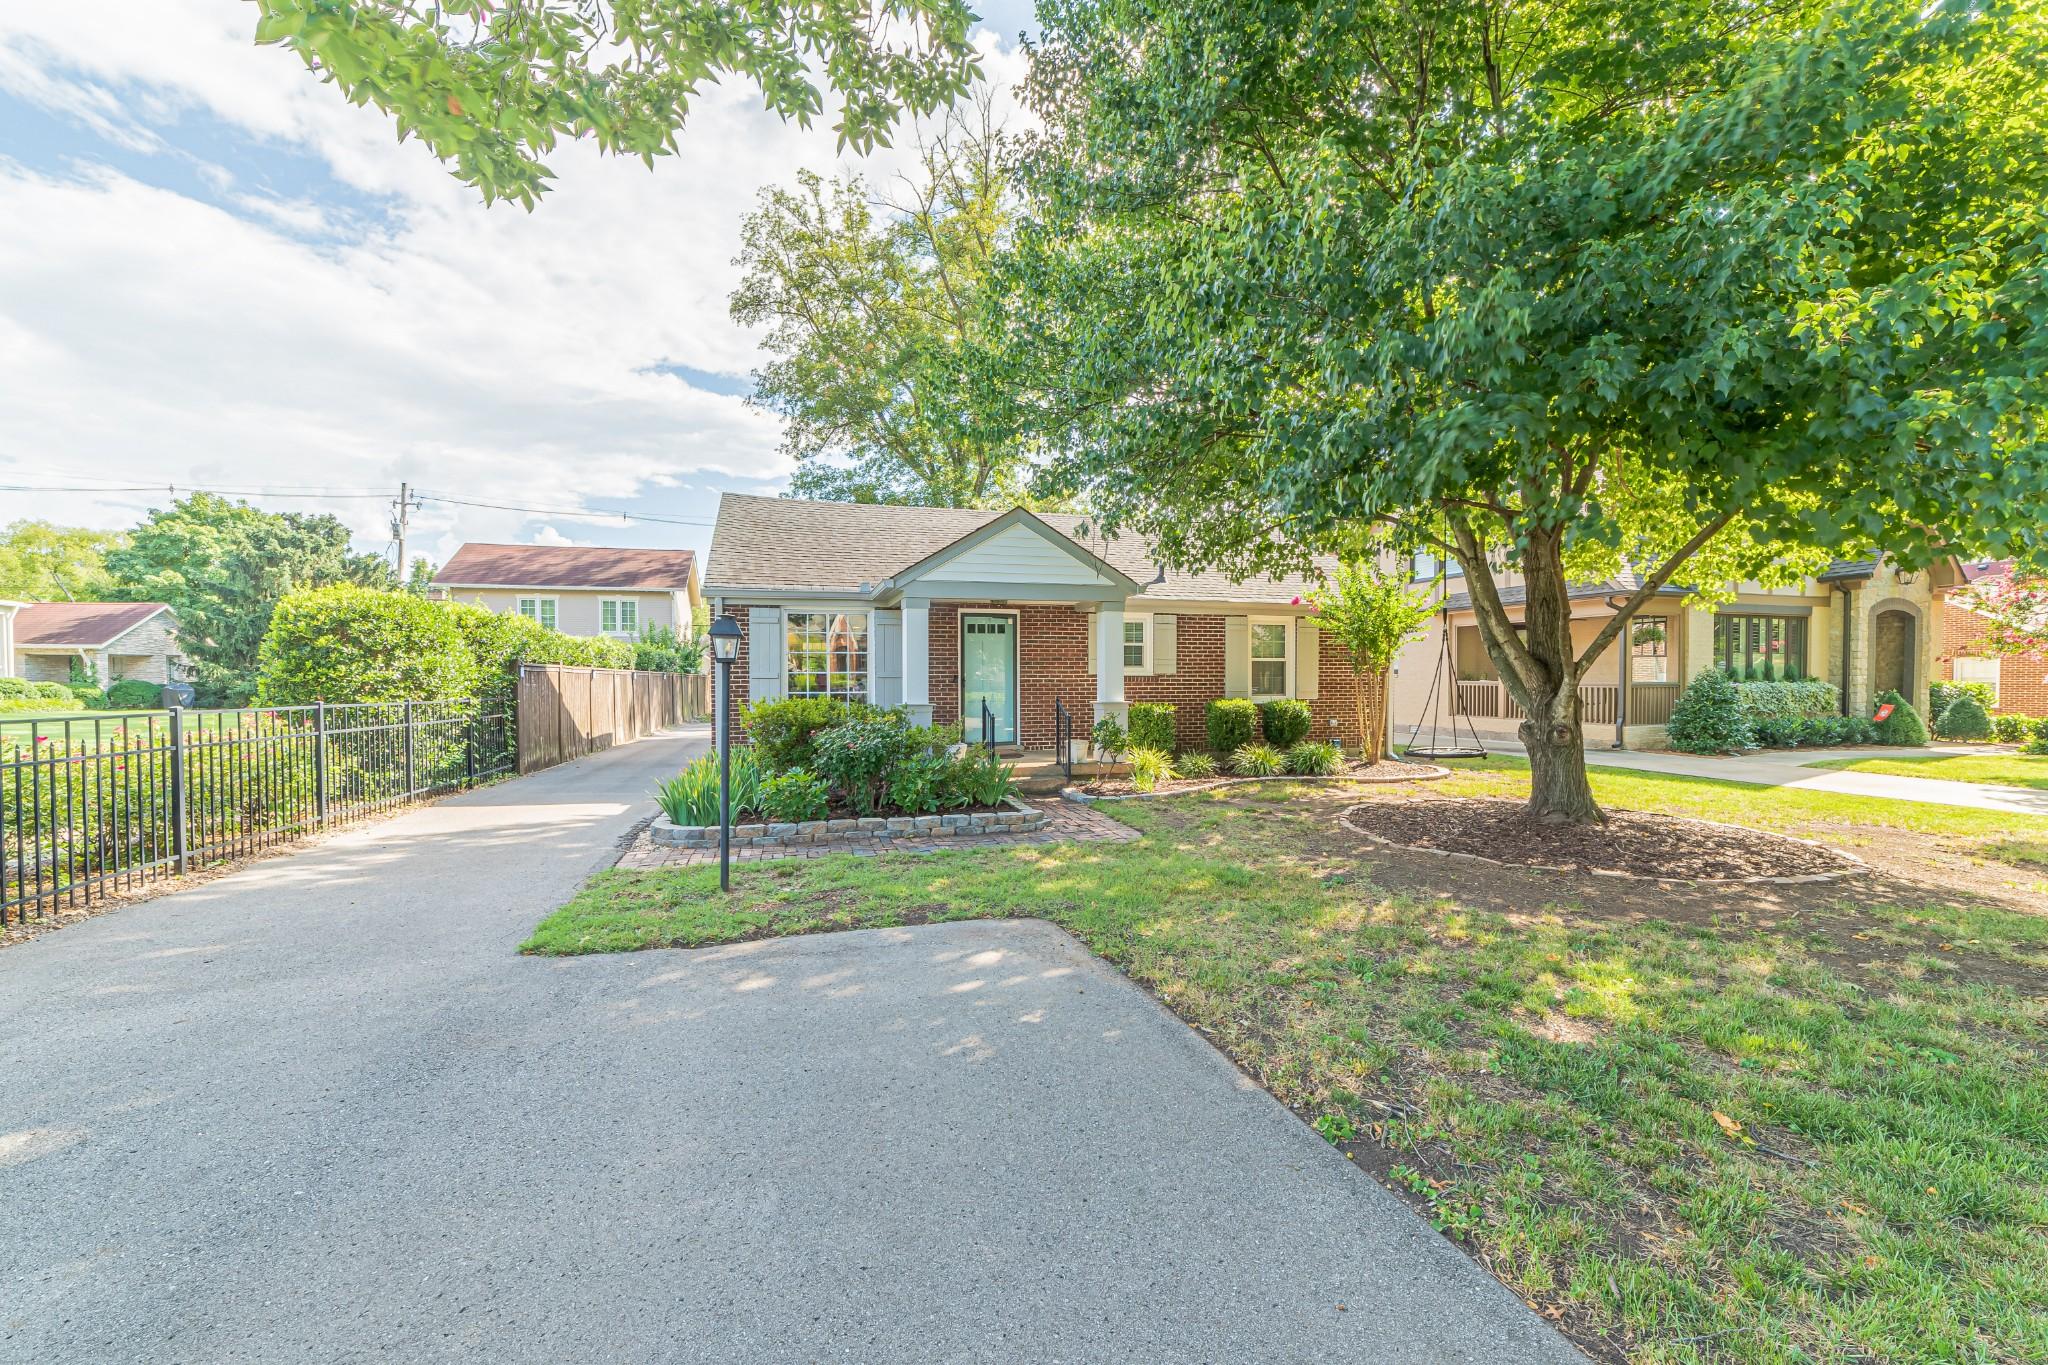 4015 Aberdeen Rd Property Photo - Nashville, TN real estate listing